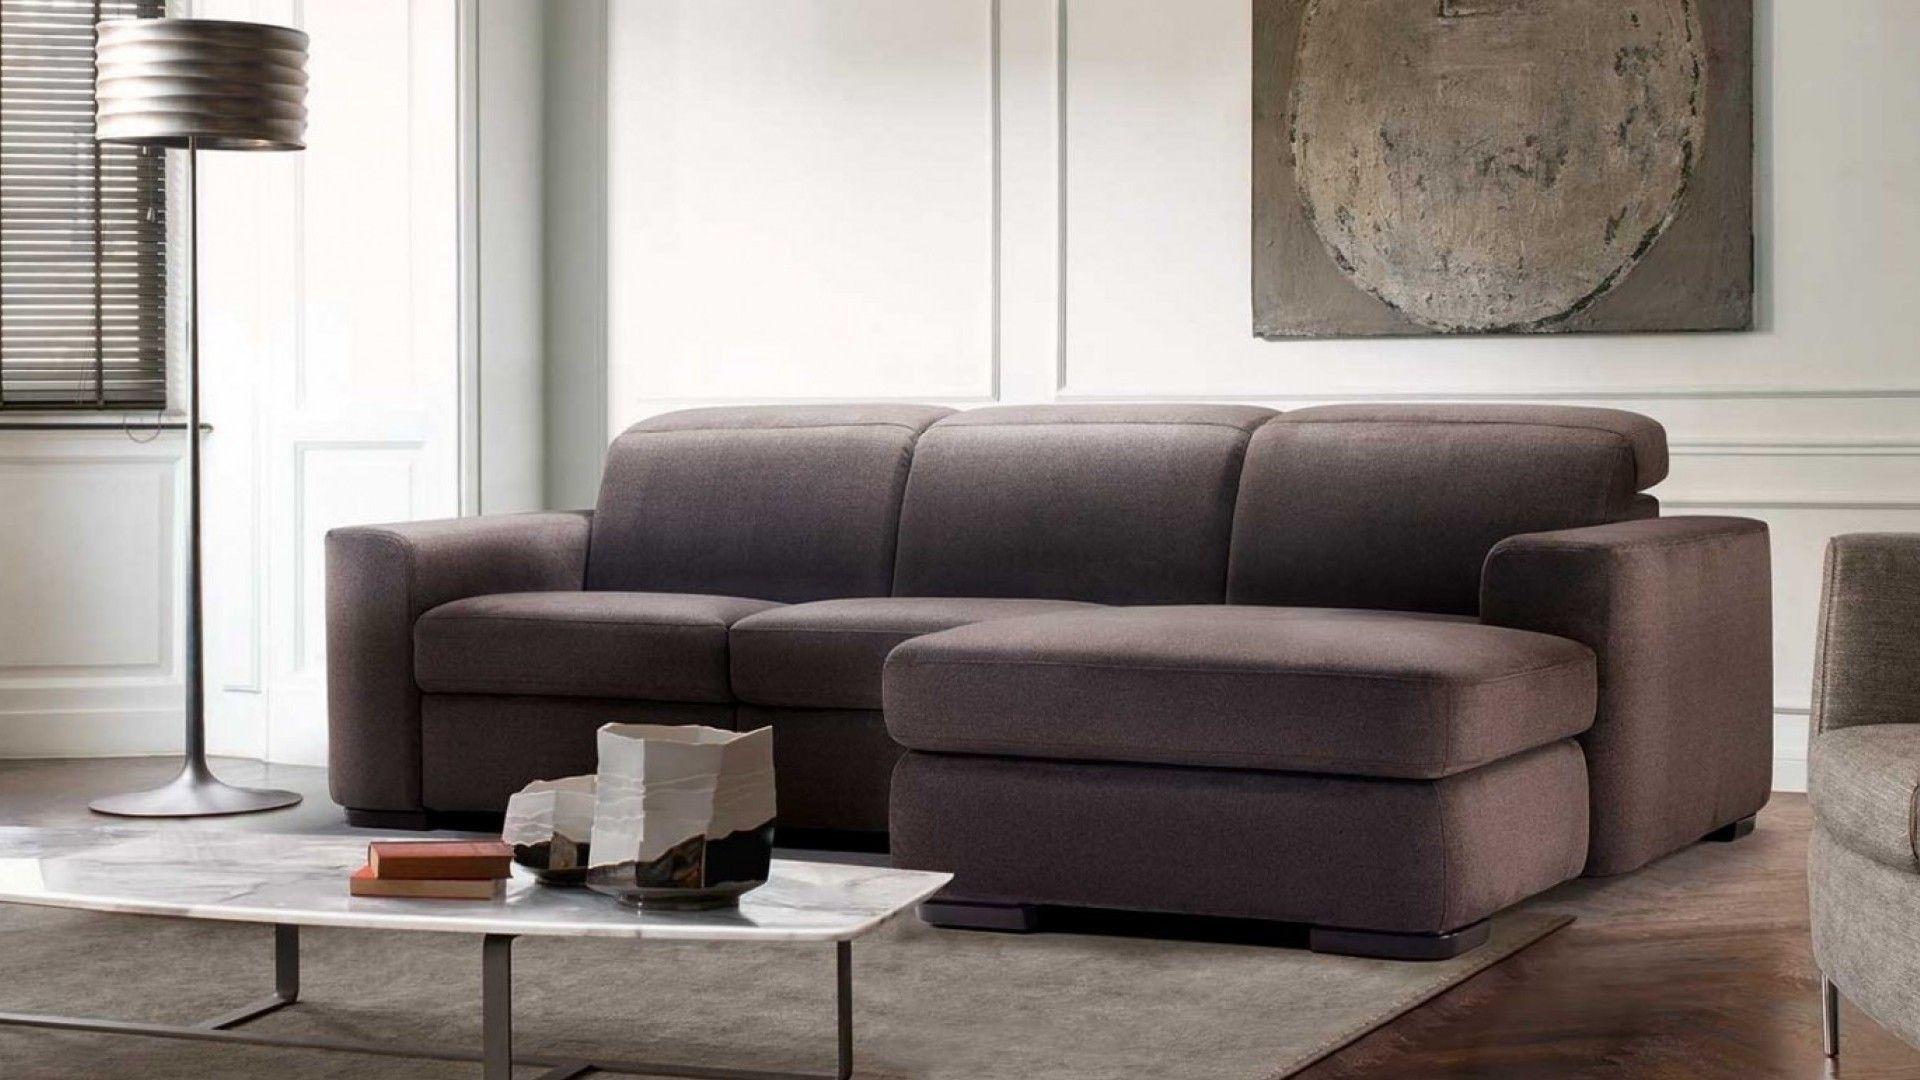 Diesis Natuzzi Oh for a beautiful sofa